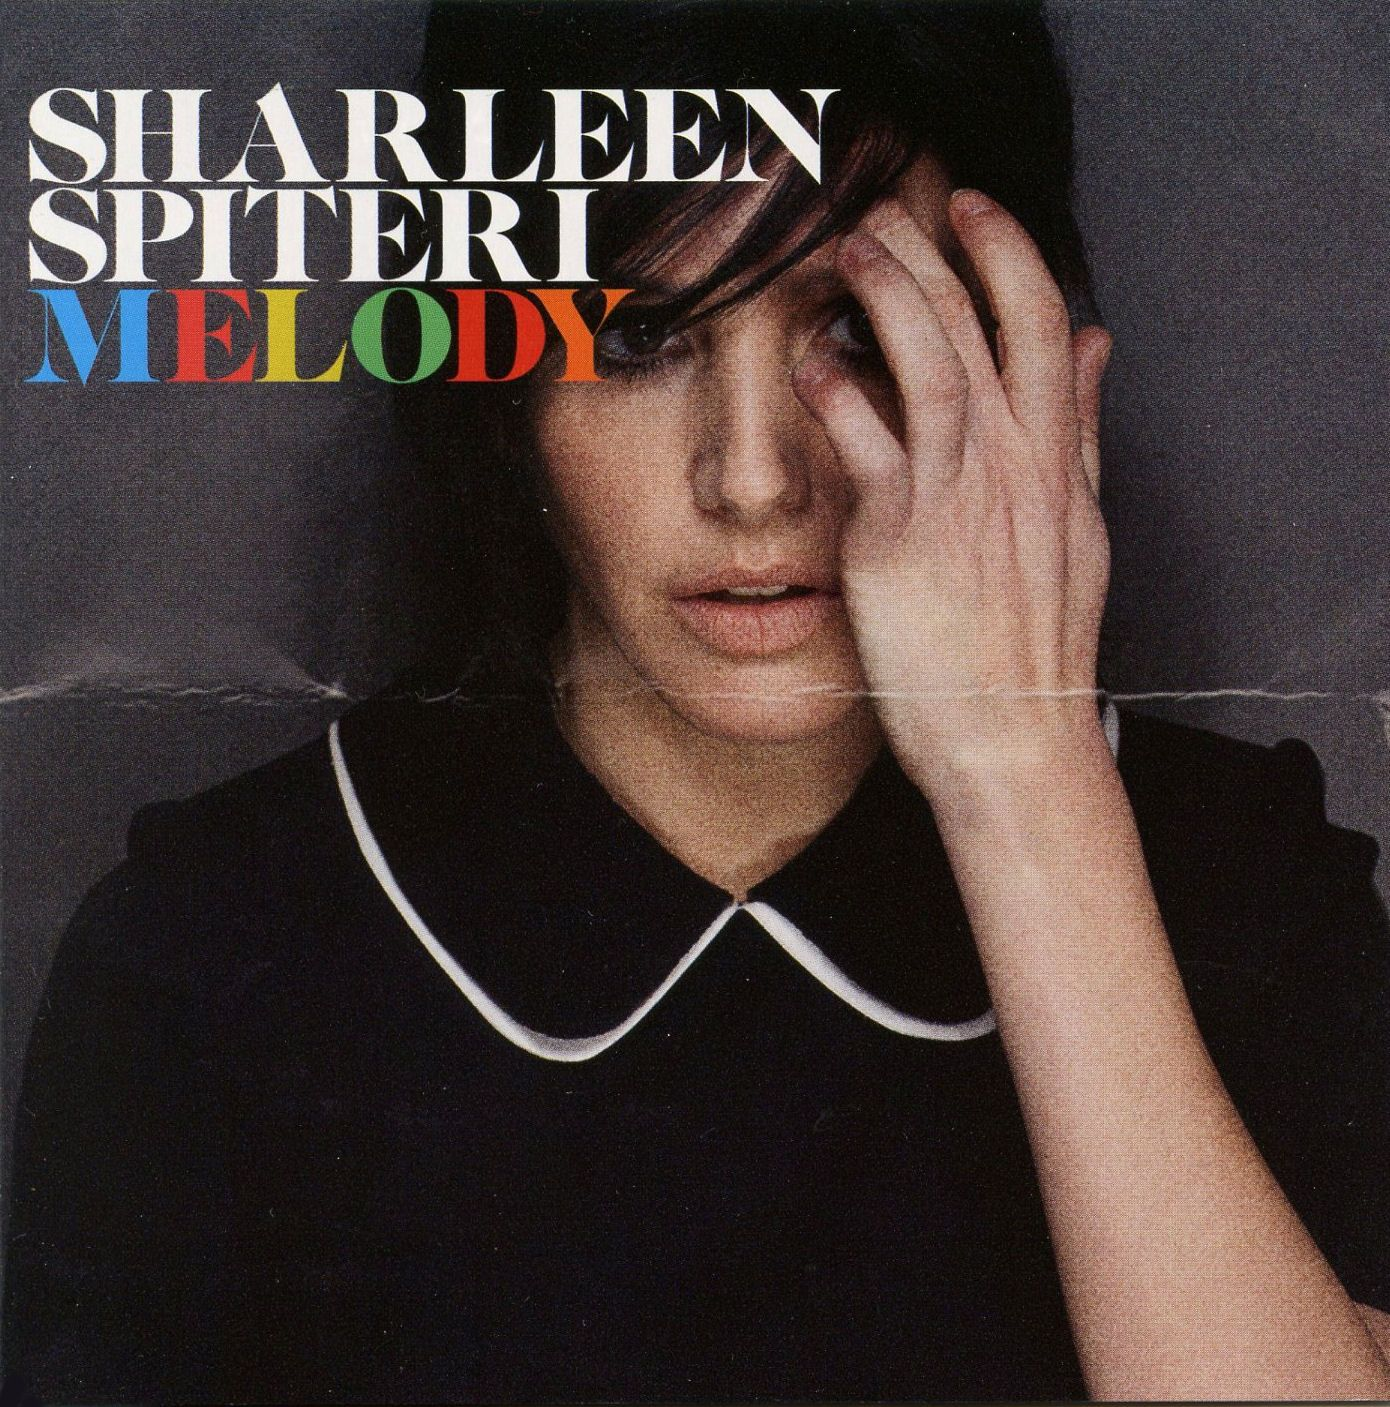 Sharleen Spiteri - Melody album cover